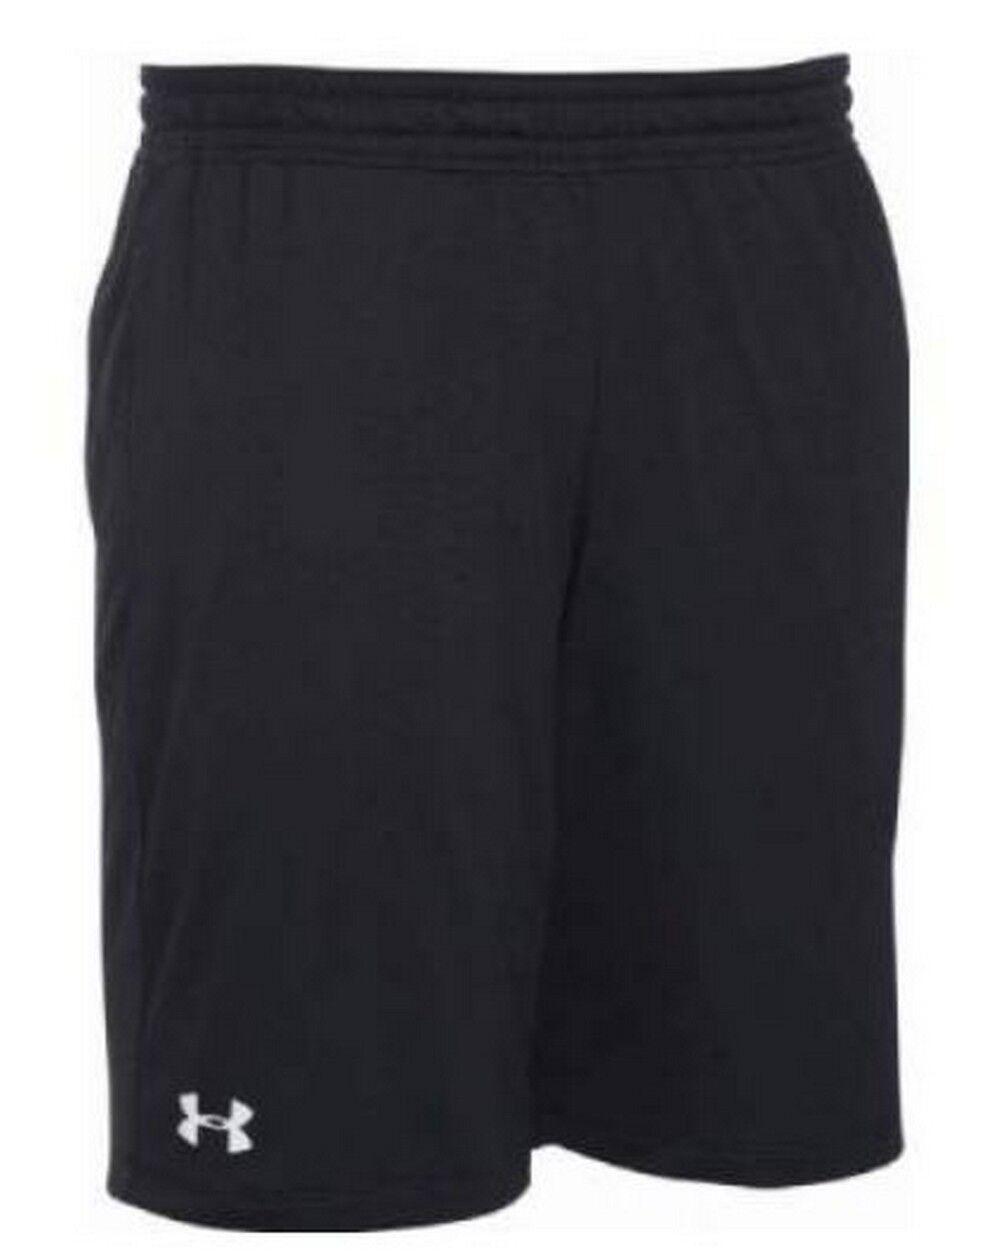 "Under Armour Men/'s UA Raid 9/"" Printed Training Shorts 4XL XXXXL  Save 30/%!!"